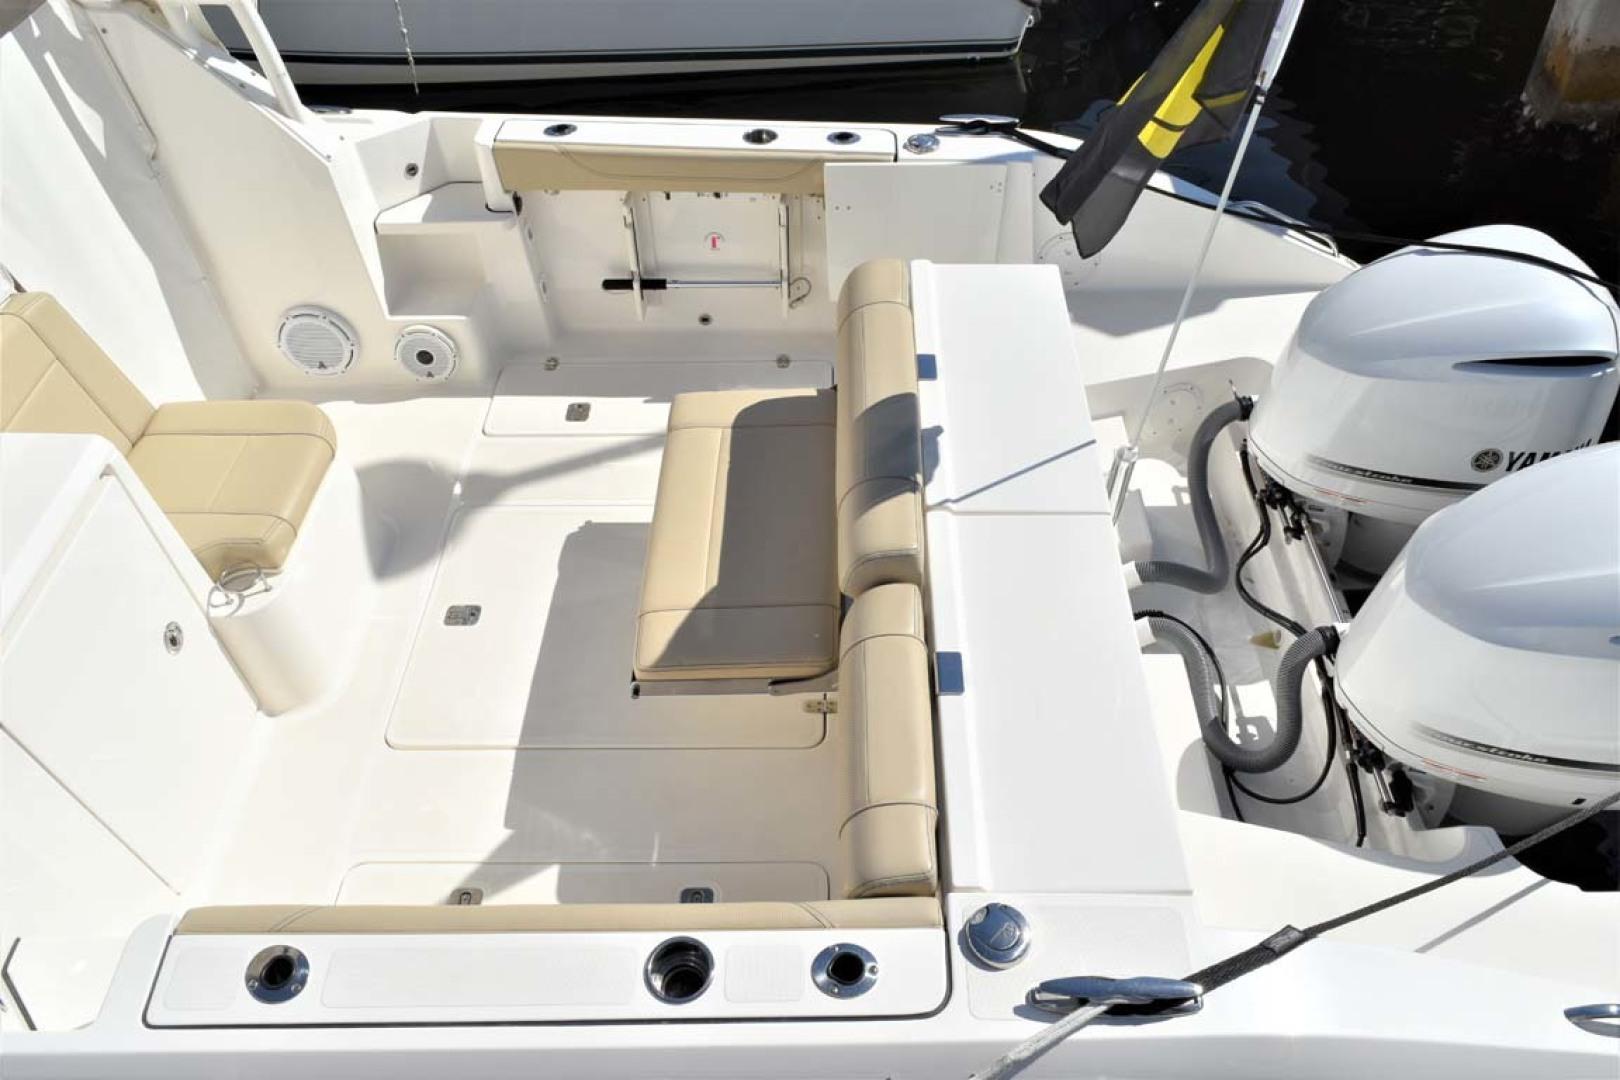 Pursuit-325 Offshore 2020-Coo Coo Miami-Florida-United States-Cockpit-1475303 | Thumbnail